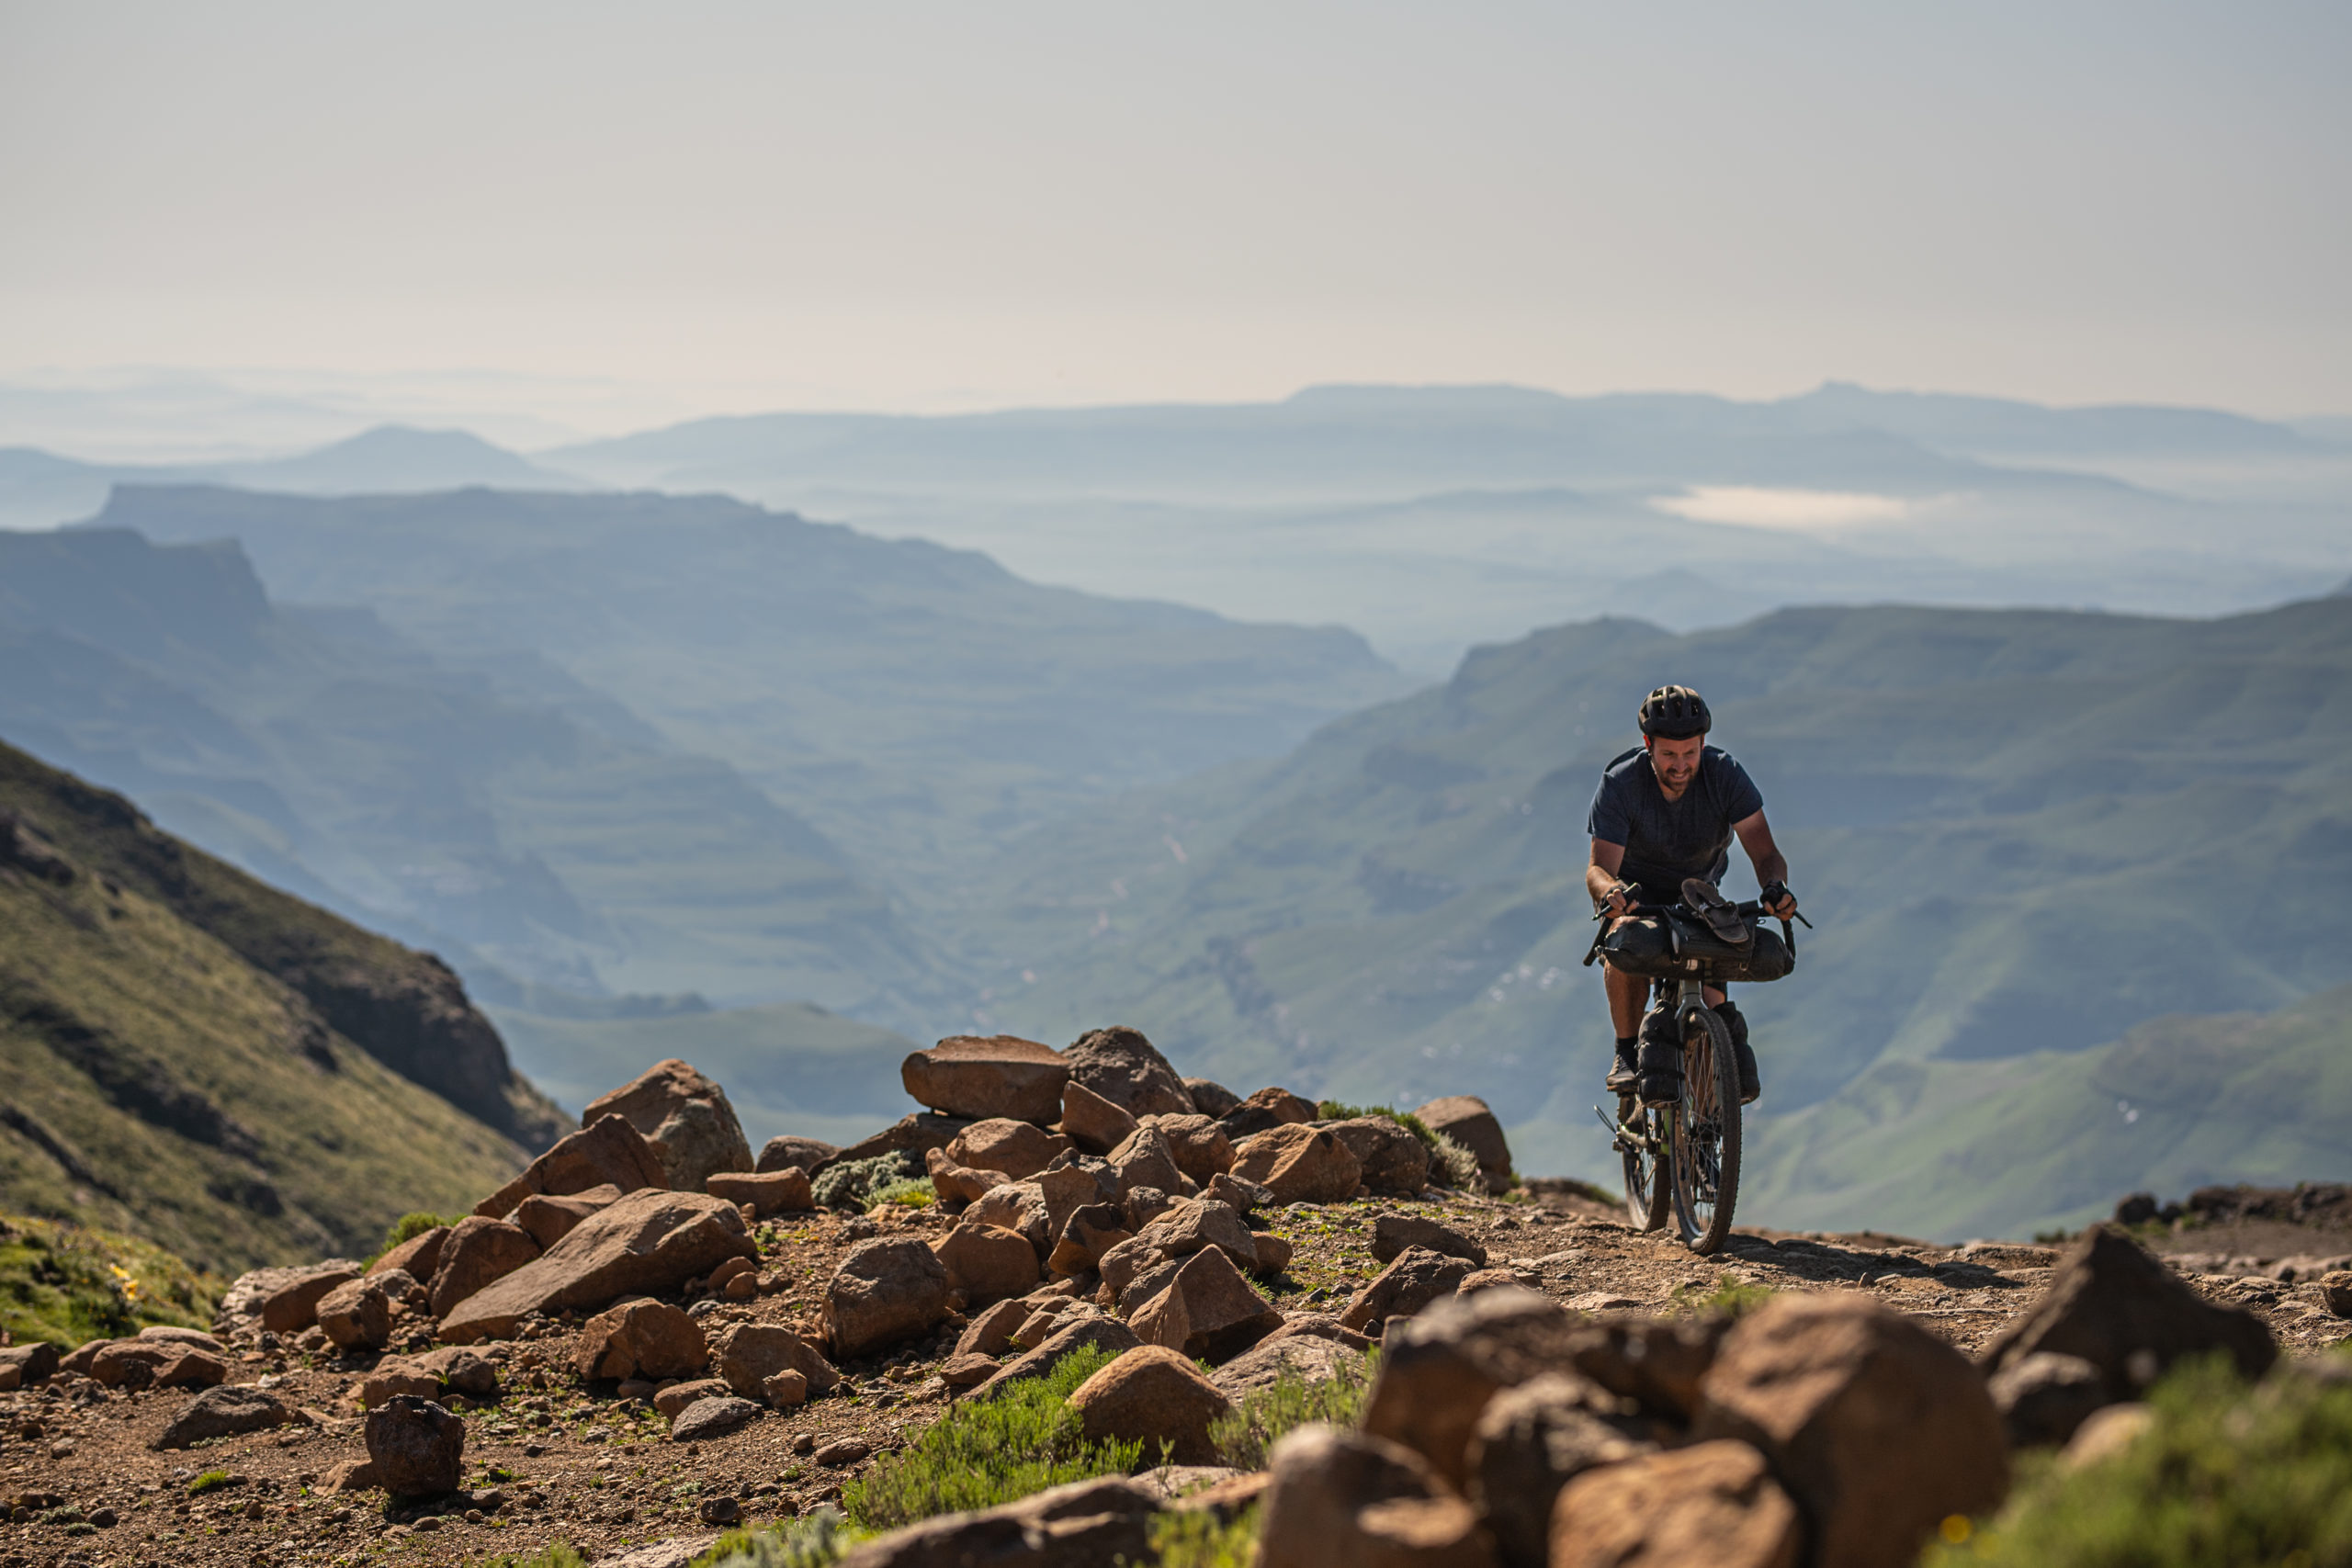 Riverside 920 Touring Bike in Lesotho